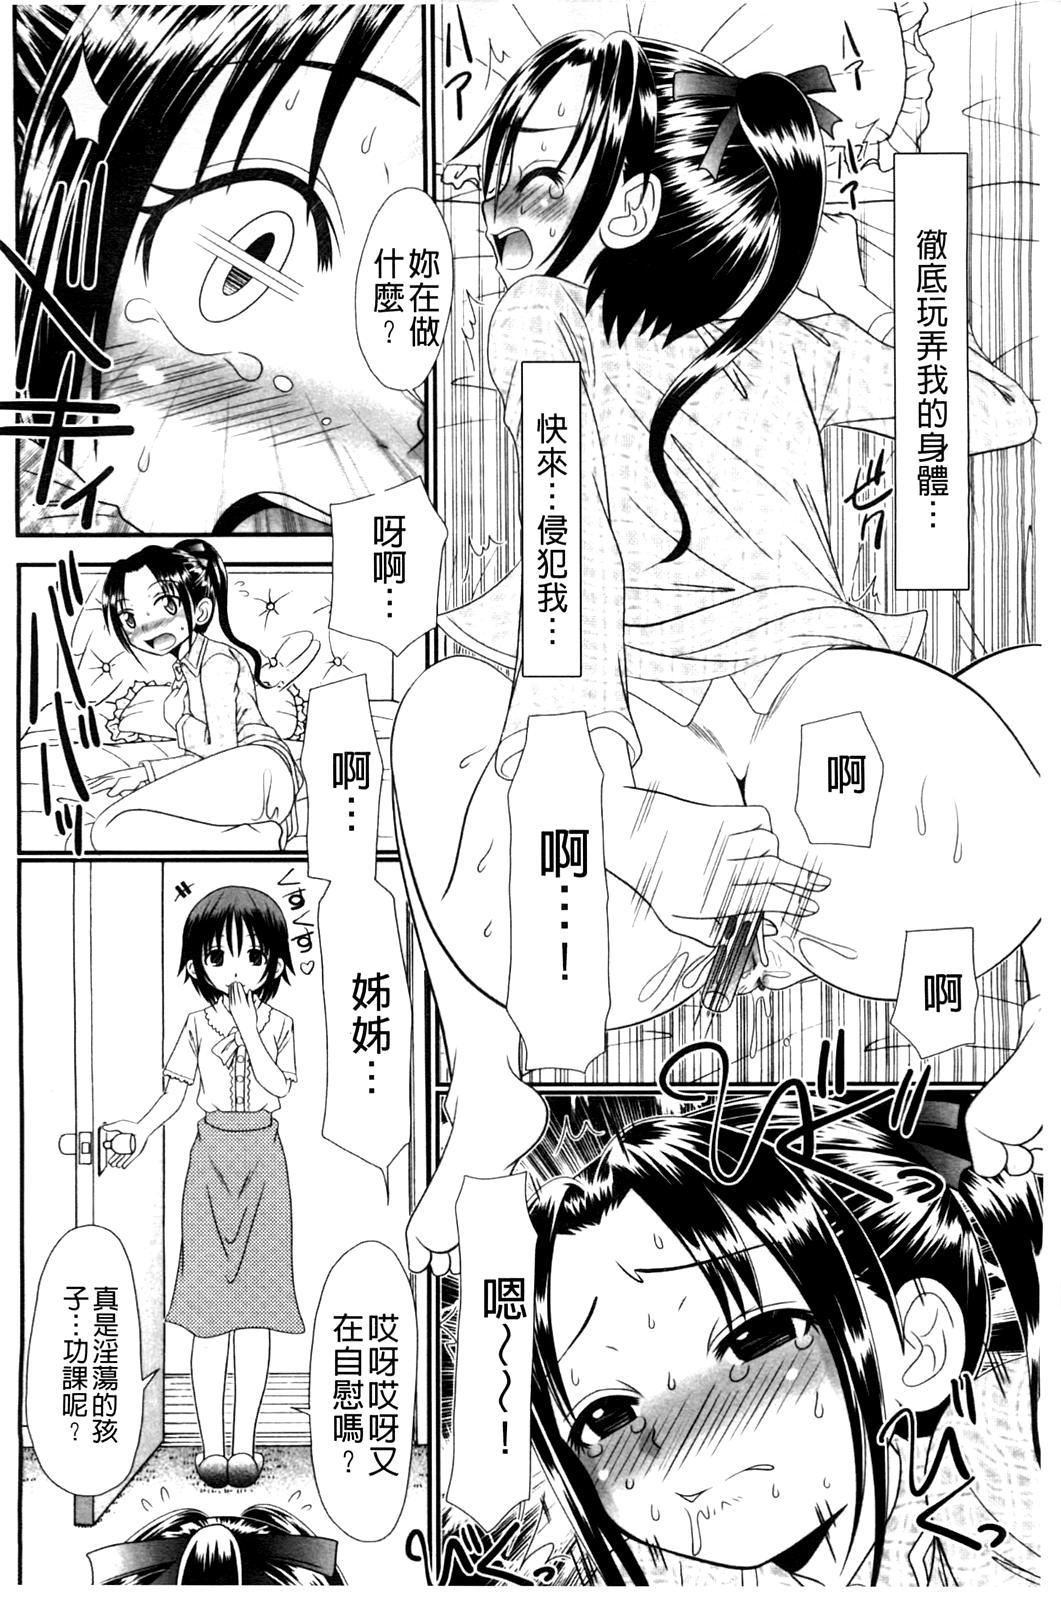 Higyaku Kyoushitsu 16